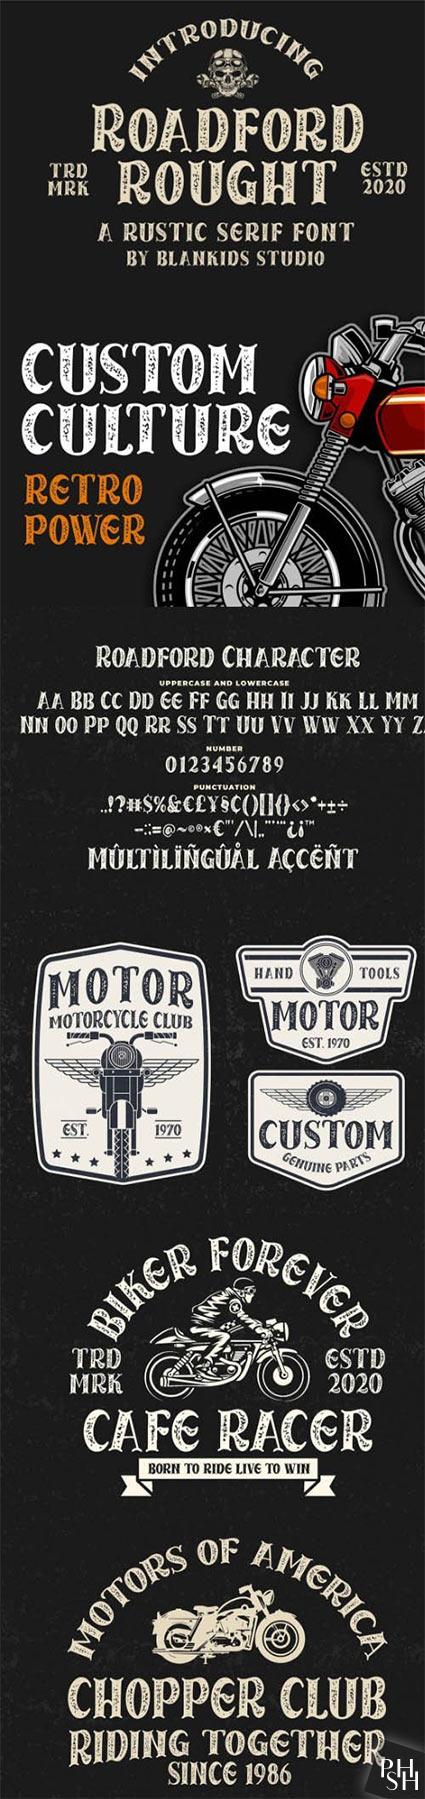 Roadford Rought - Rustic Serif Font - Шрифты - Скачать ...